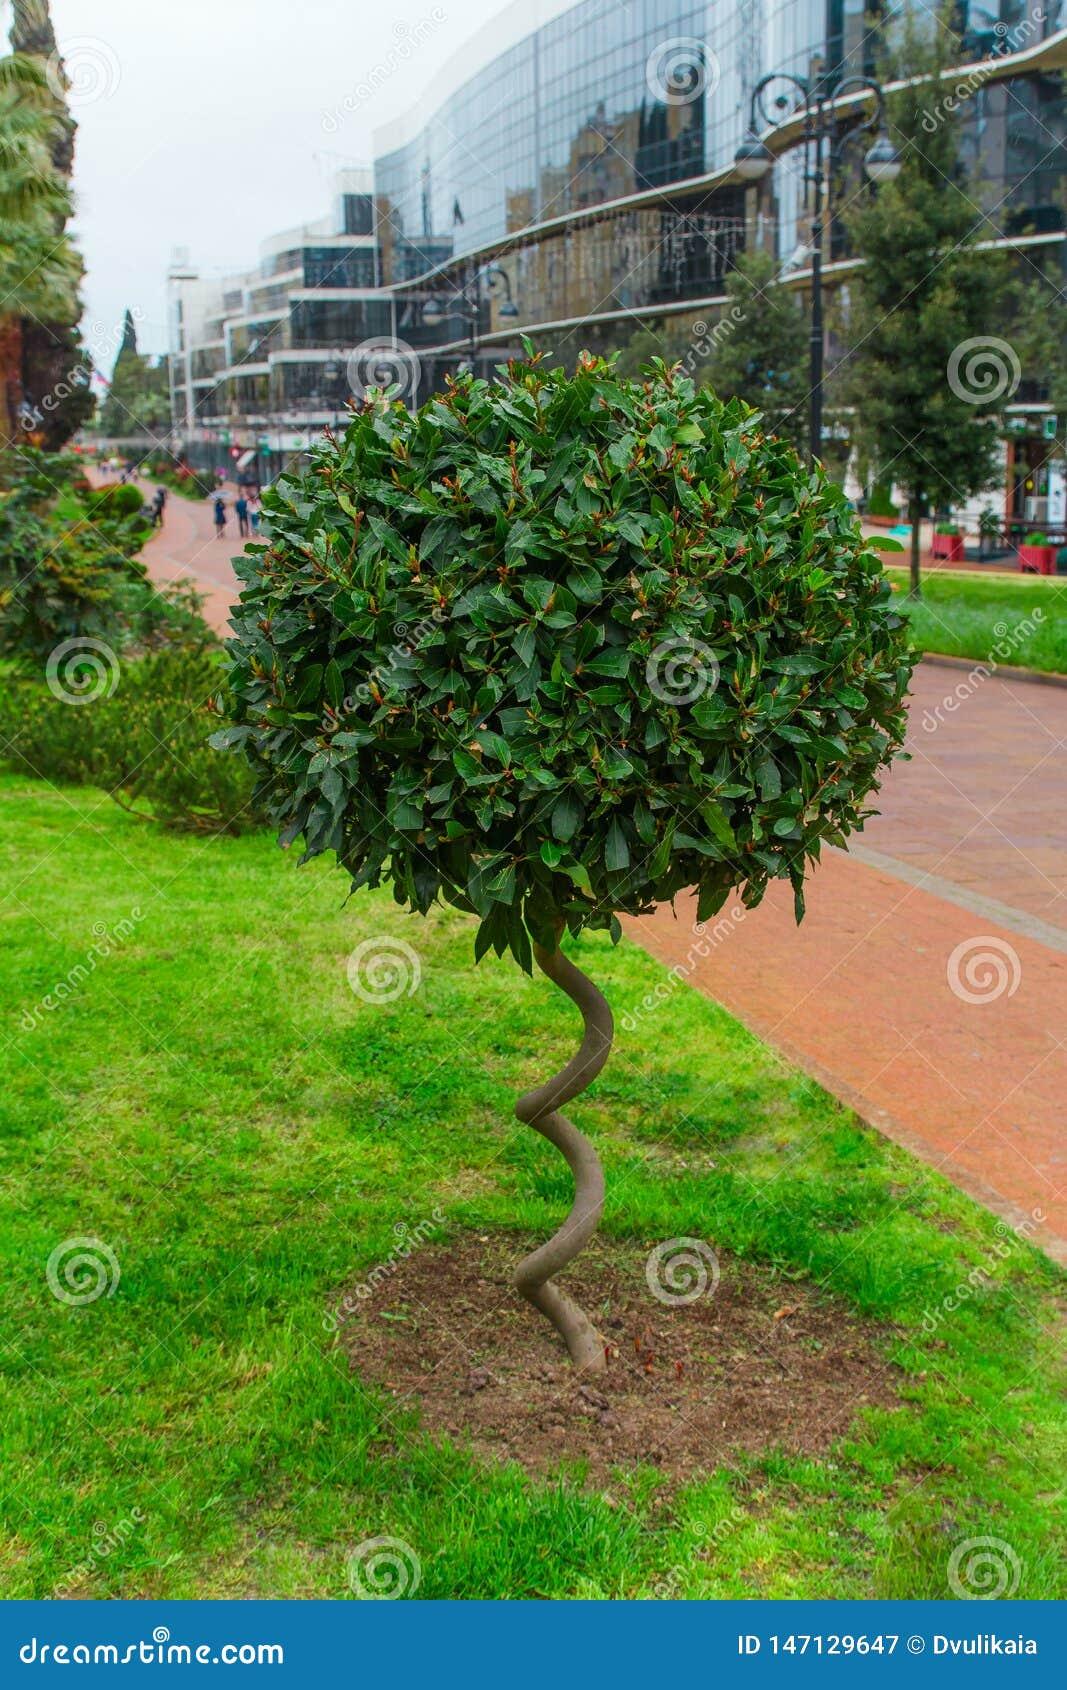 green fluffy bush with spiral trunk in a park , landscape design concept